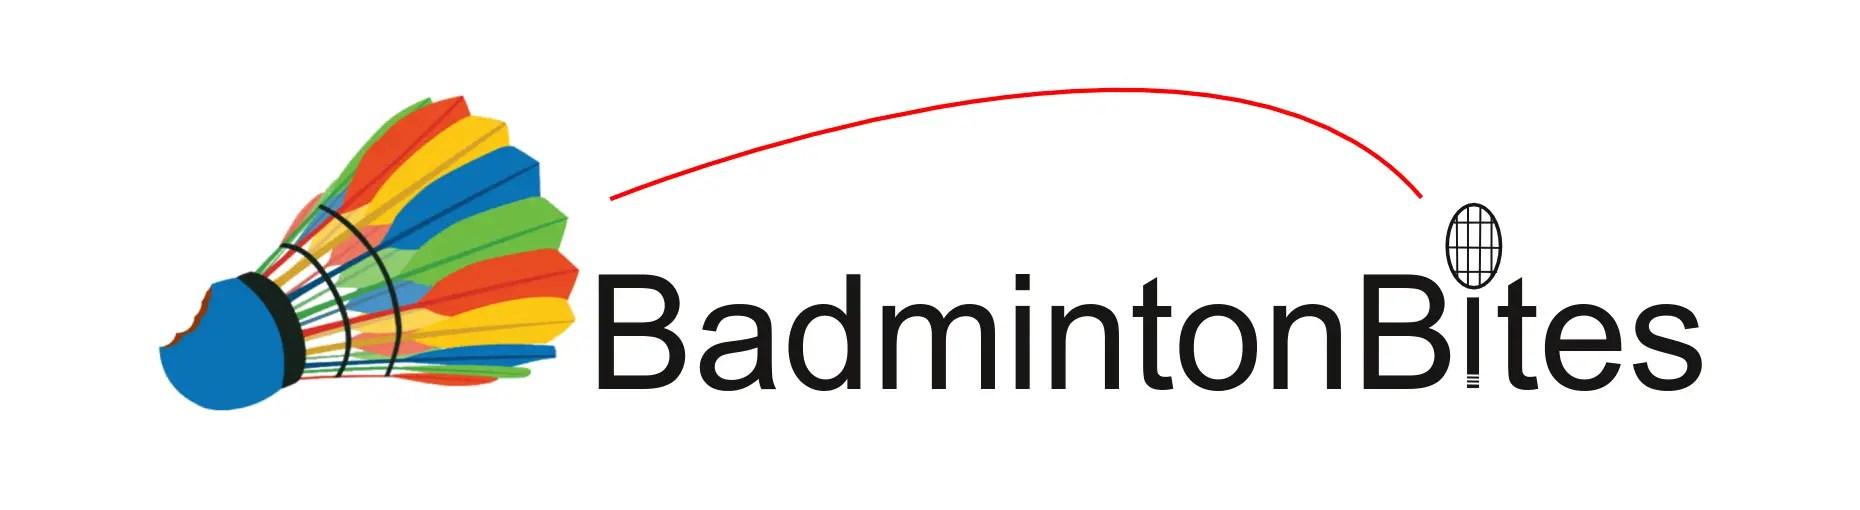 BadmintonBites